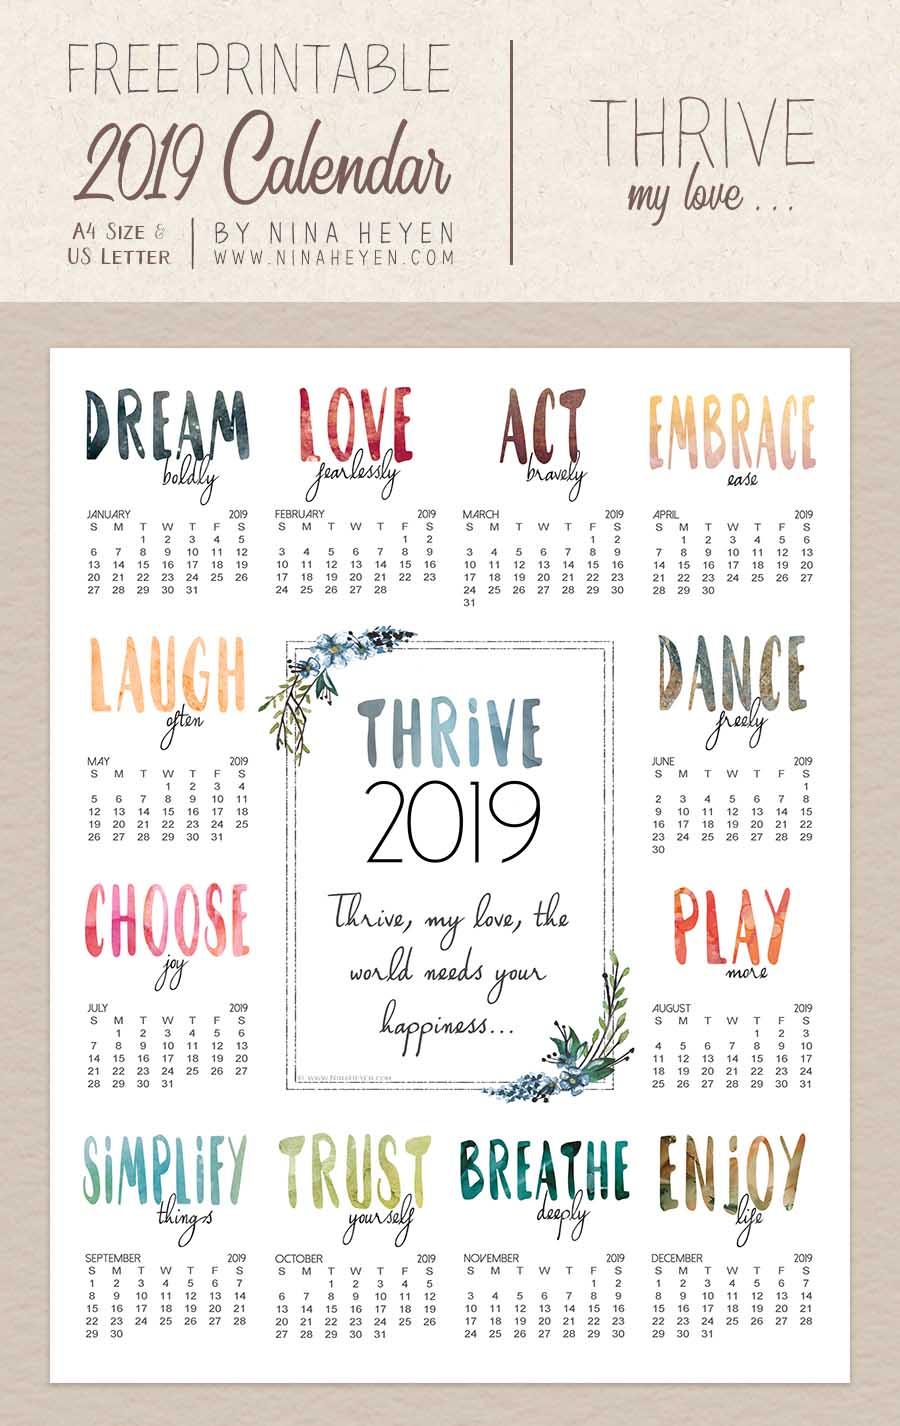 Thrive Free Printable Wall Calendar 2019 Nina Heyen